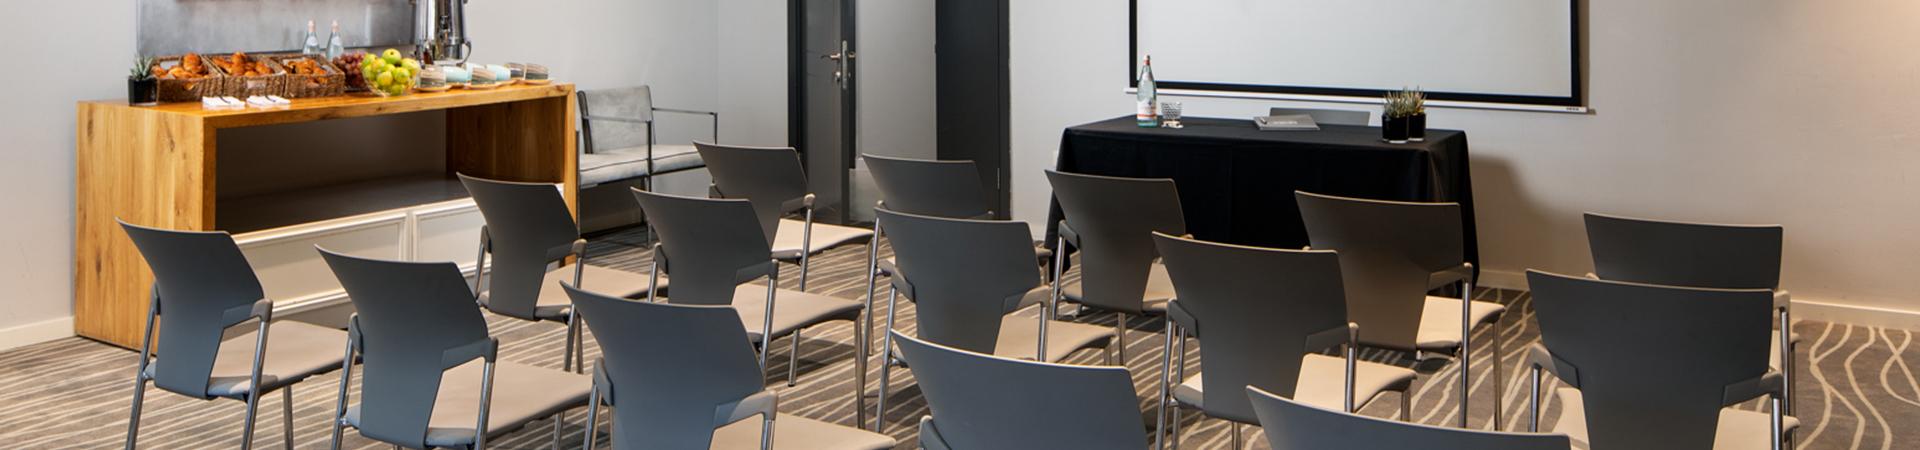 Seminars & Events